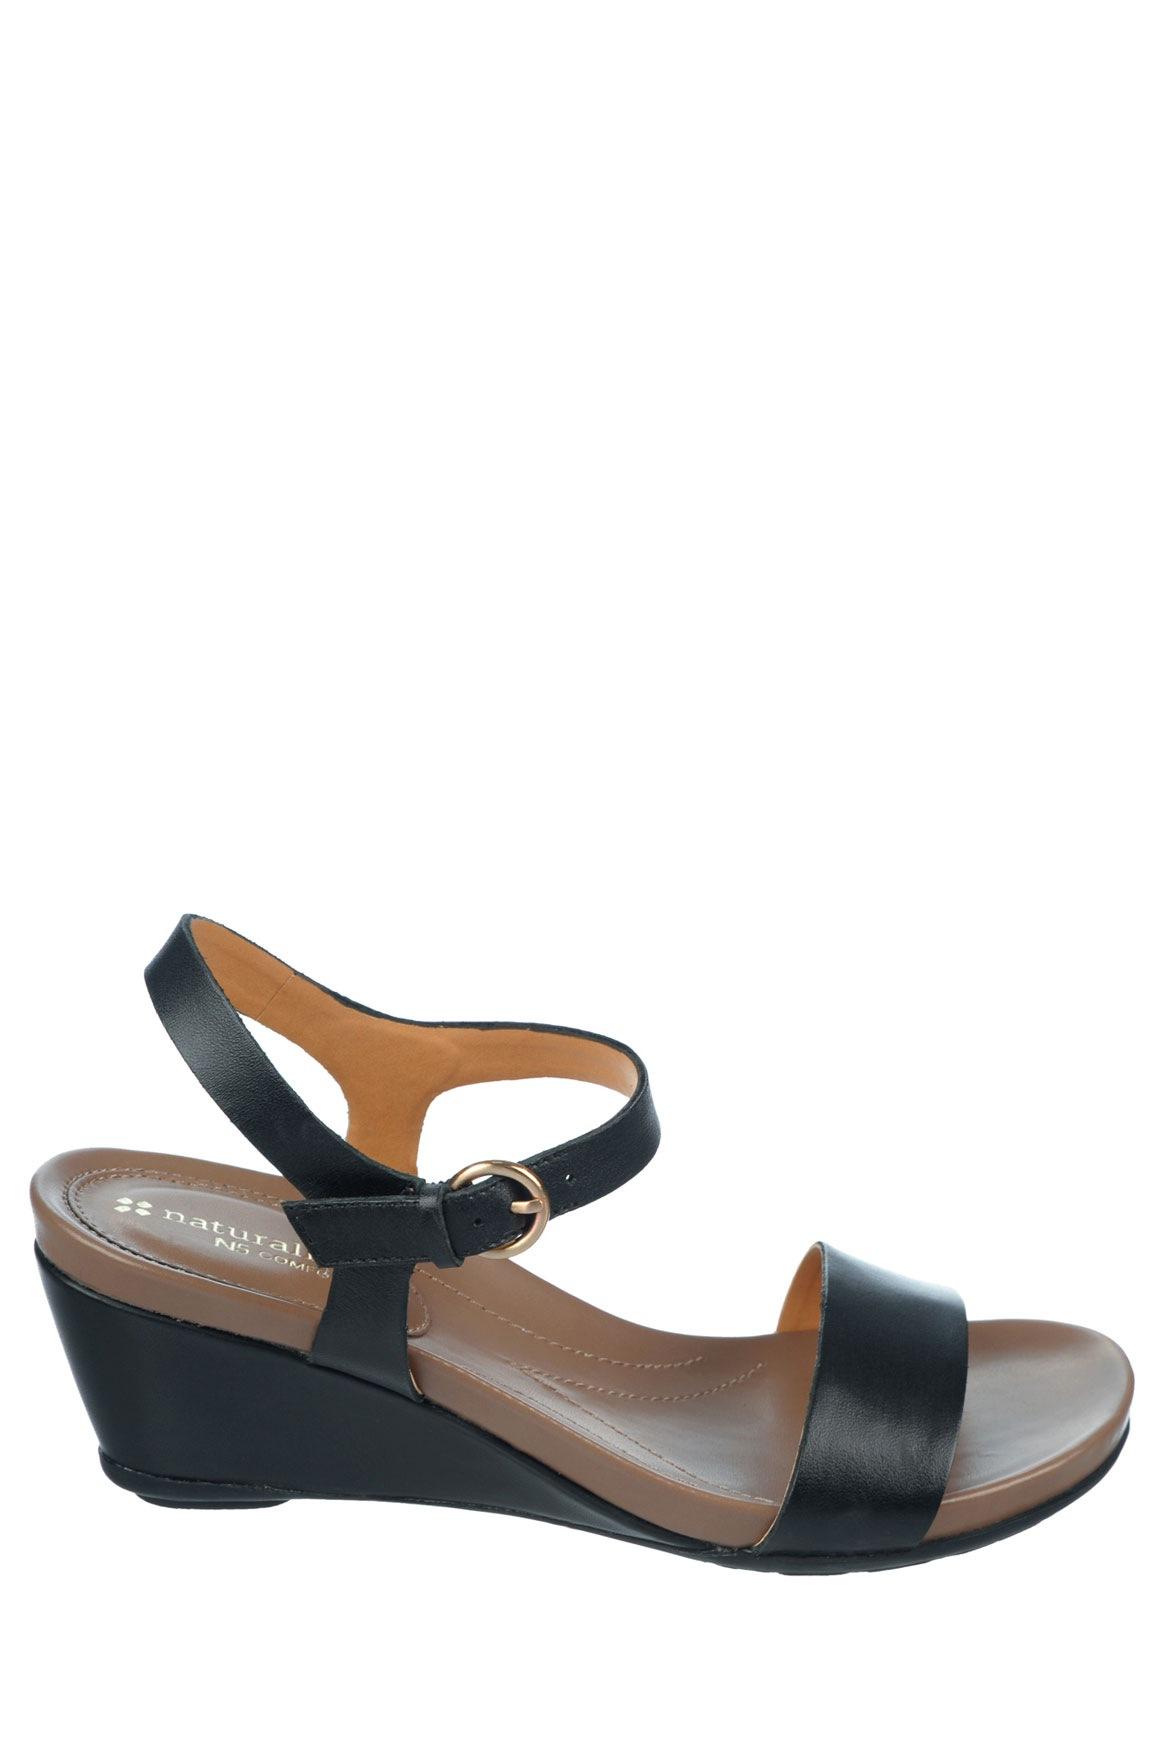 Black sandals myer - Black Sandals Myer 3